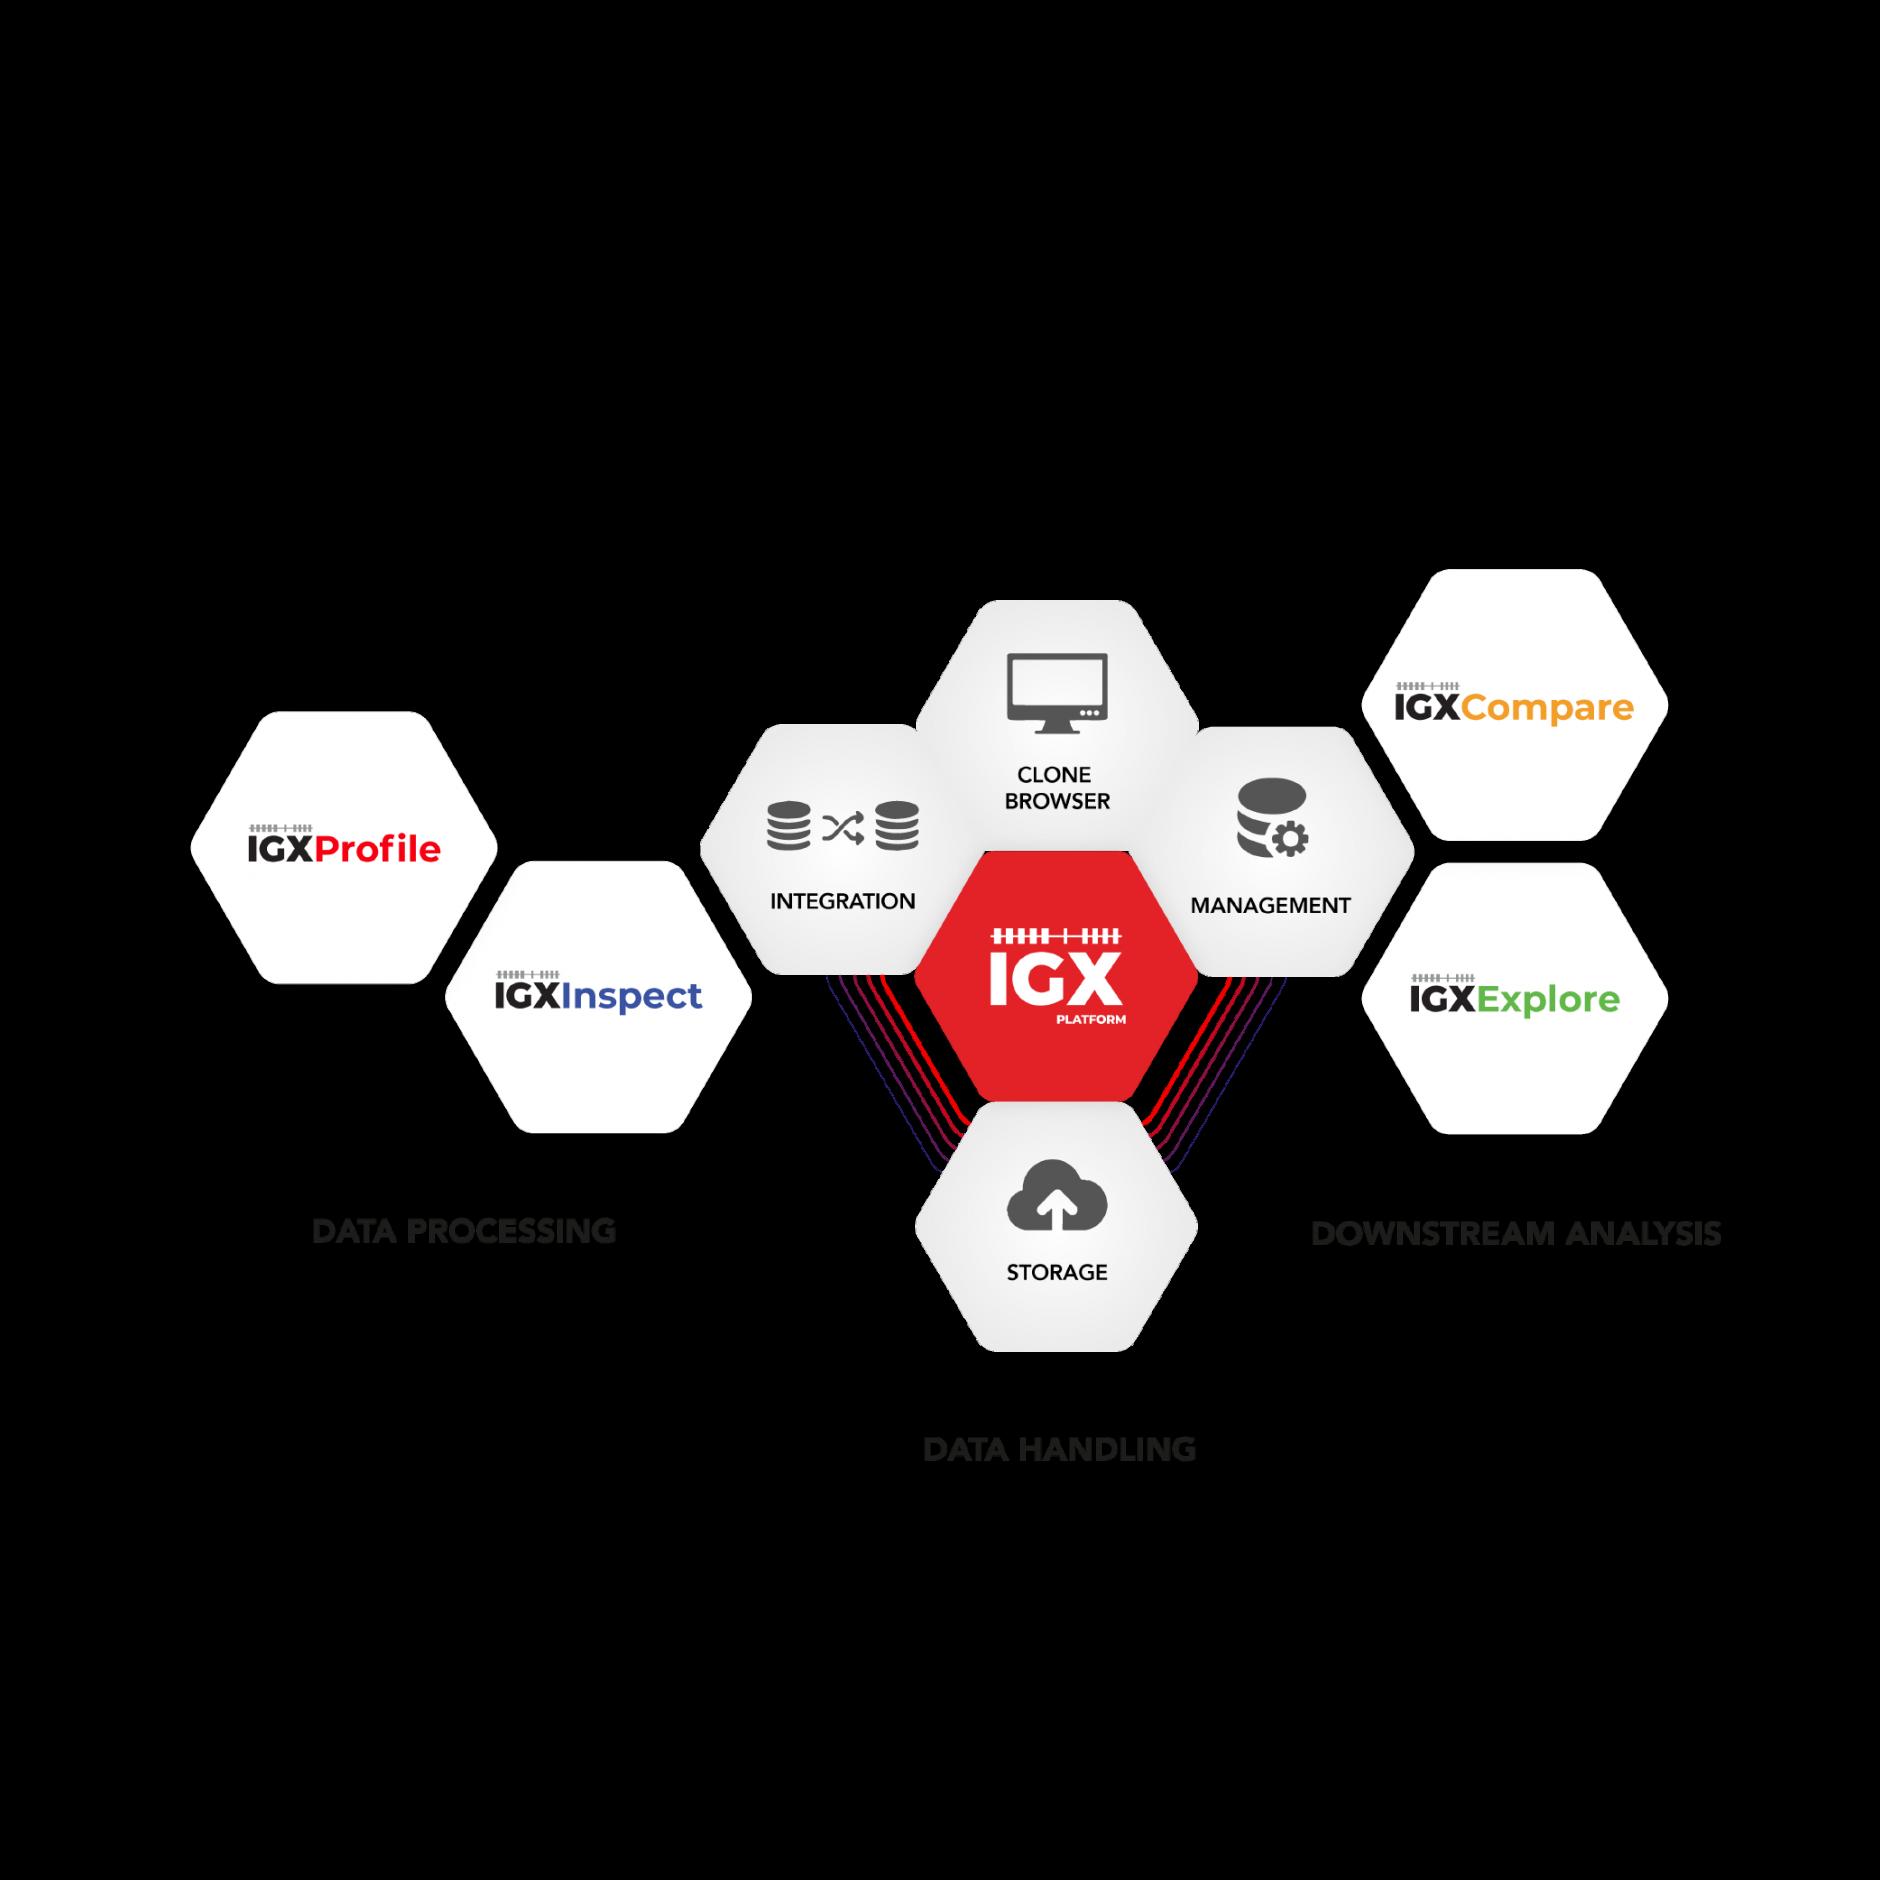 Modular IGX Platform architecture